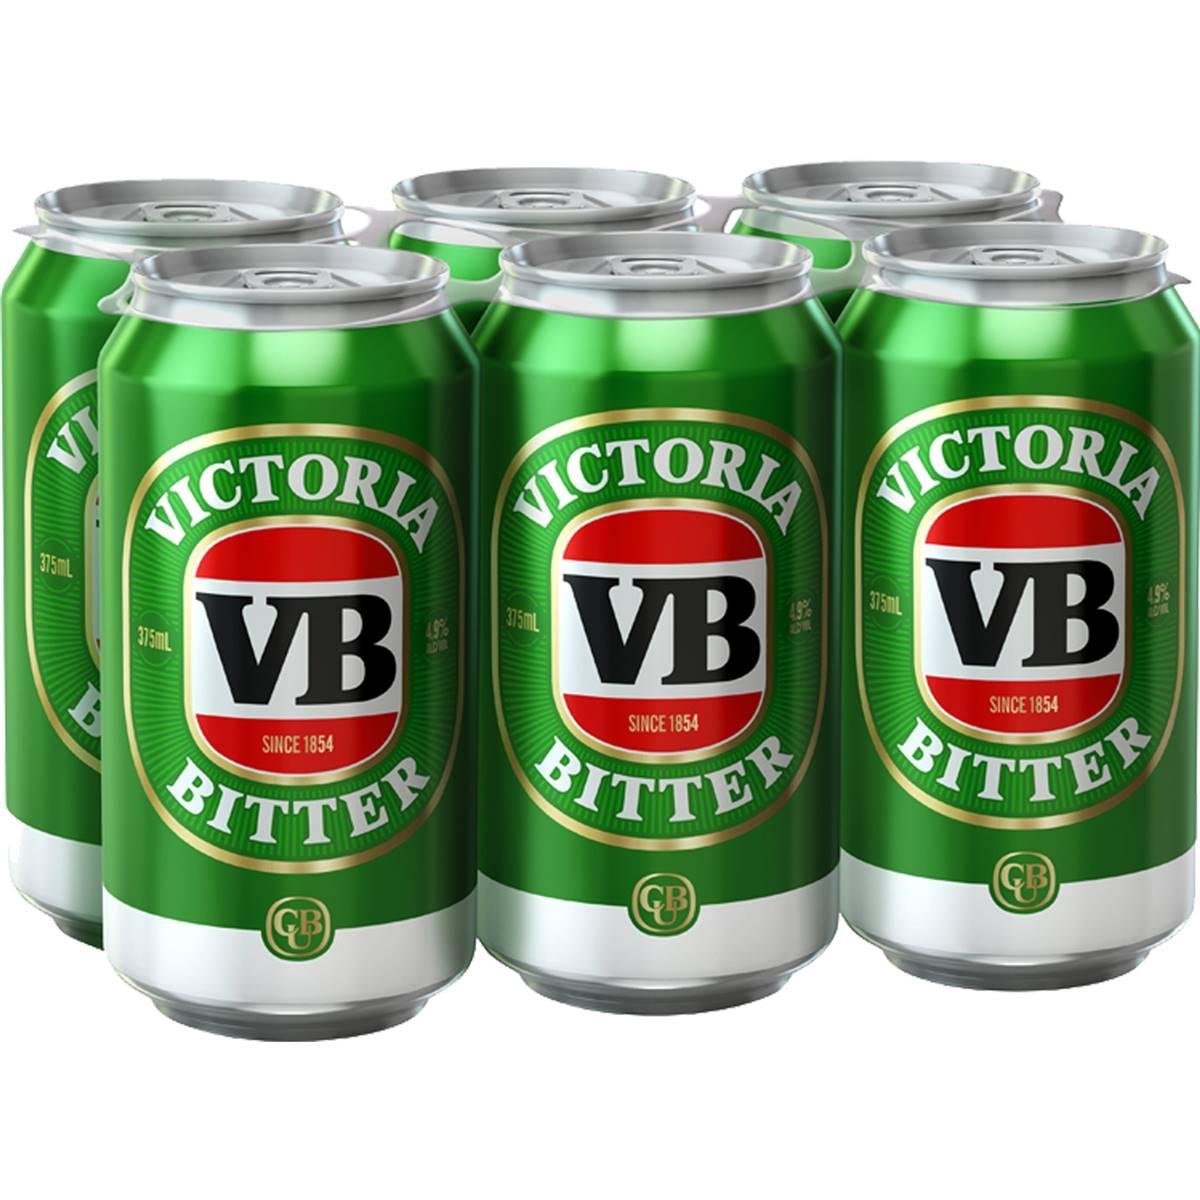 vb-cans.jpg